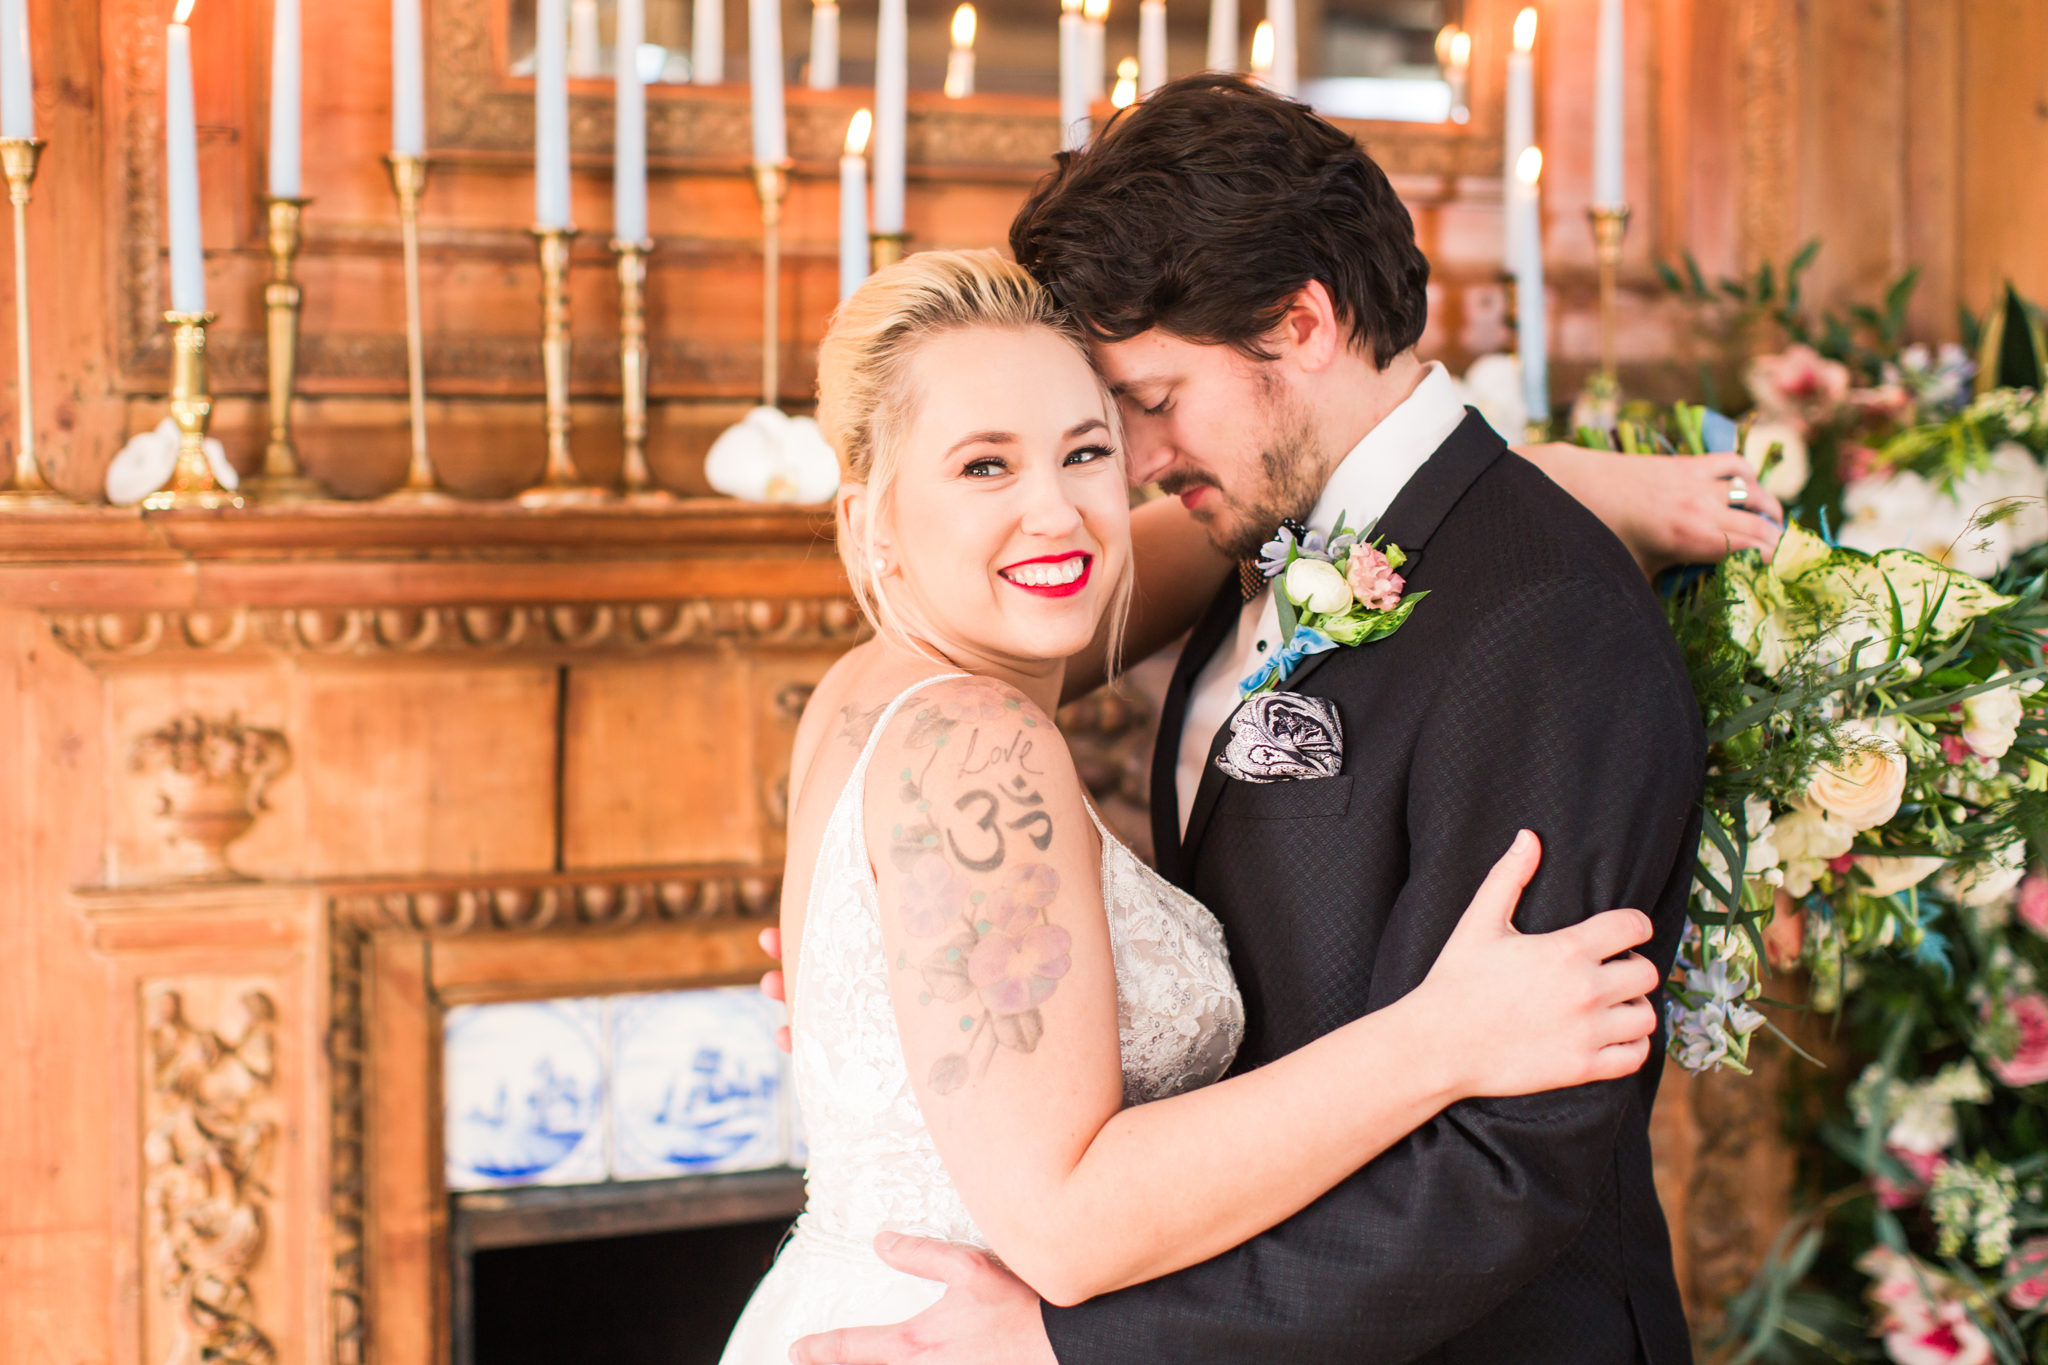 Haley Mansion Winter Wedding - Shaina Lee Photography-236.jpg